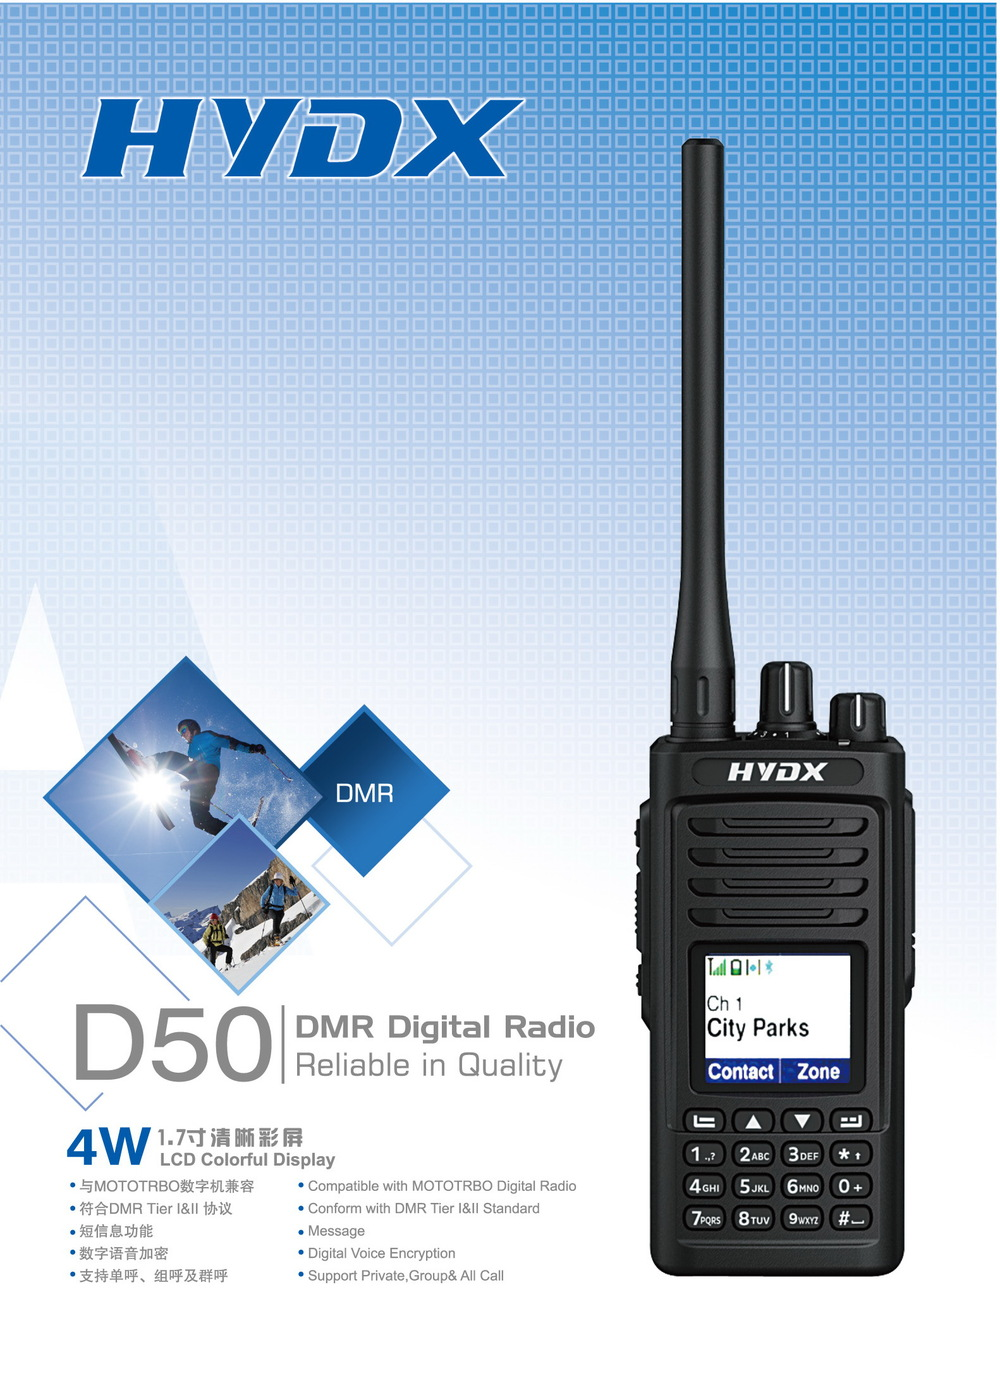 DMR walkie talkie HYDX -D50 with software, View DMR, D50